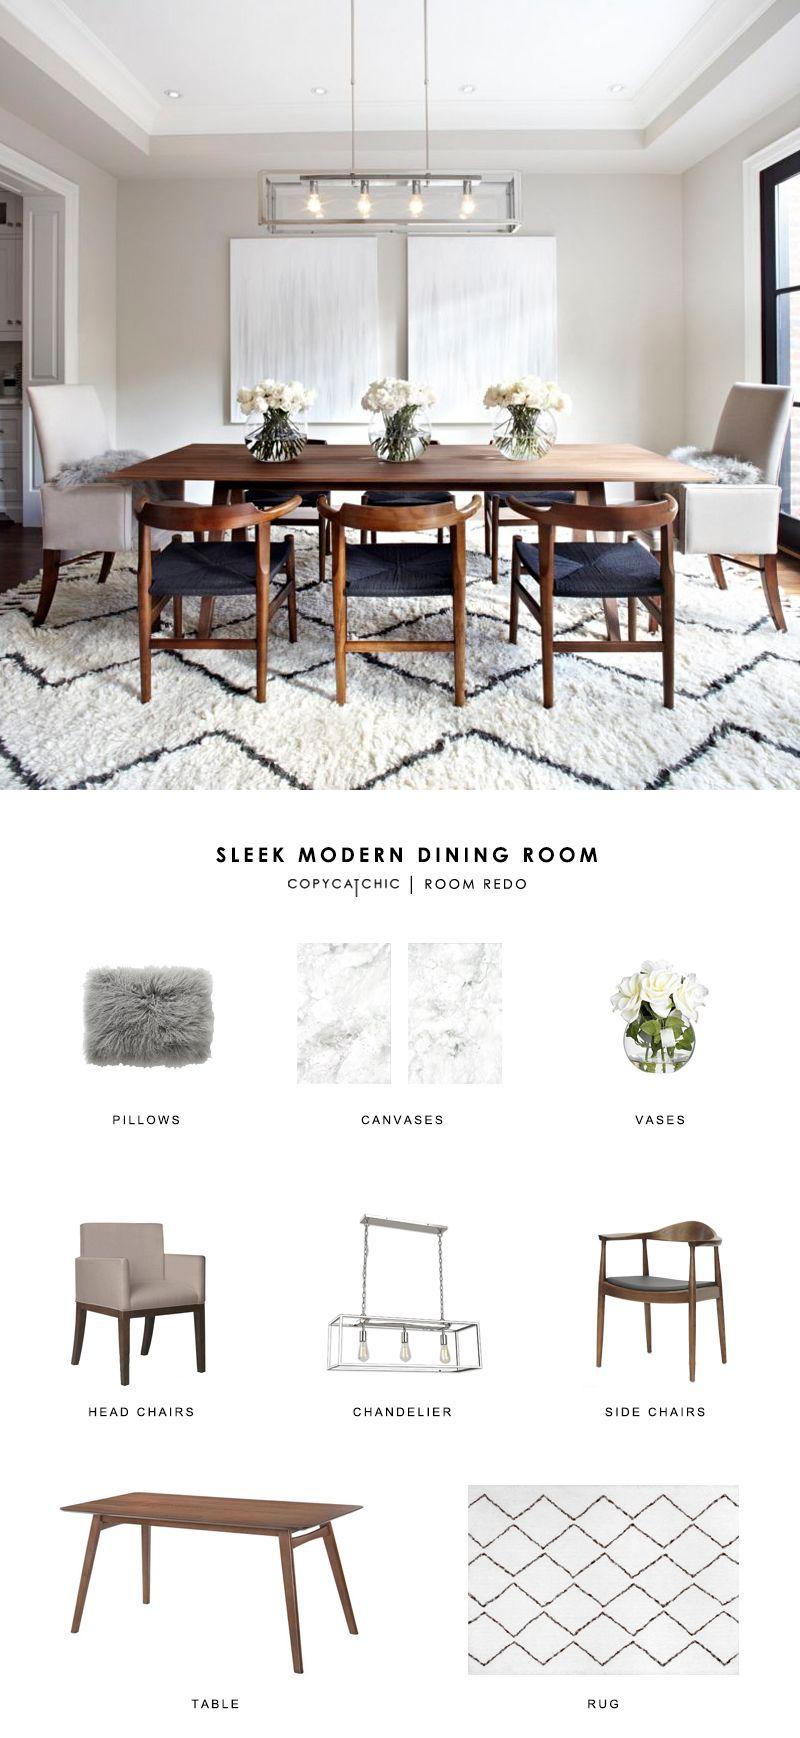 chic modern dining room set. Copy Cat Chic Room Redo  Sleek Modern Dining cat chic cats and